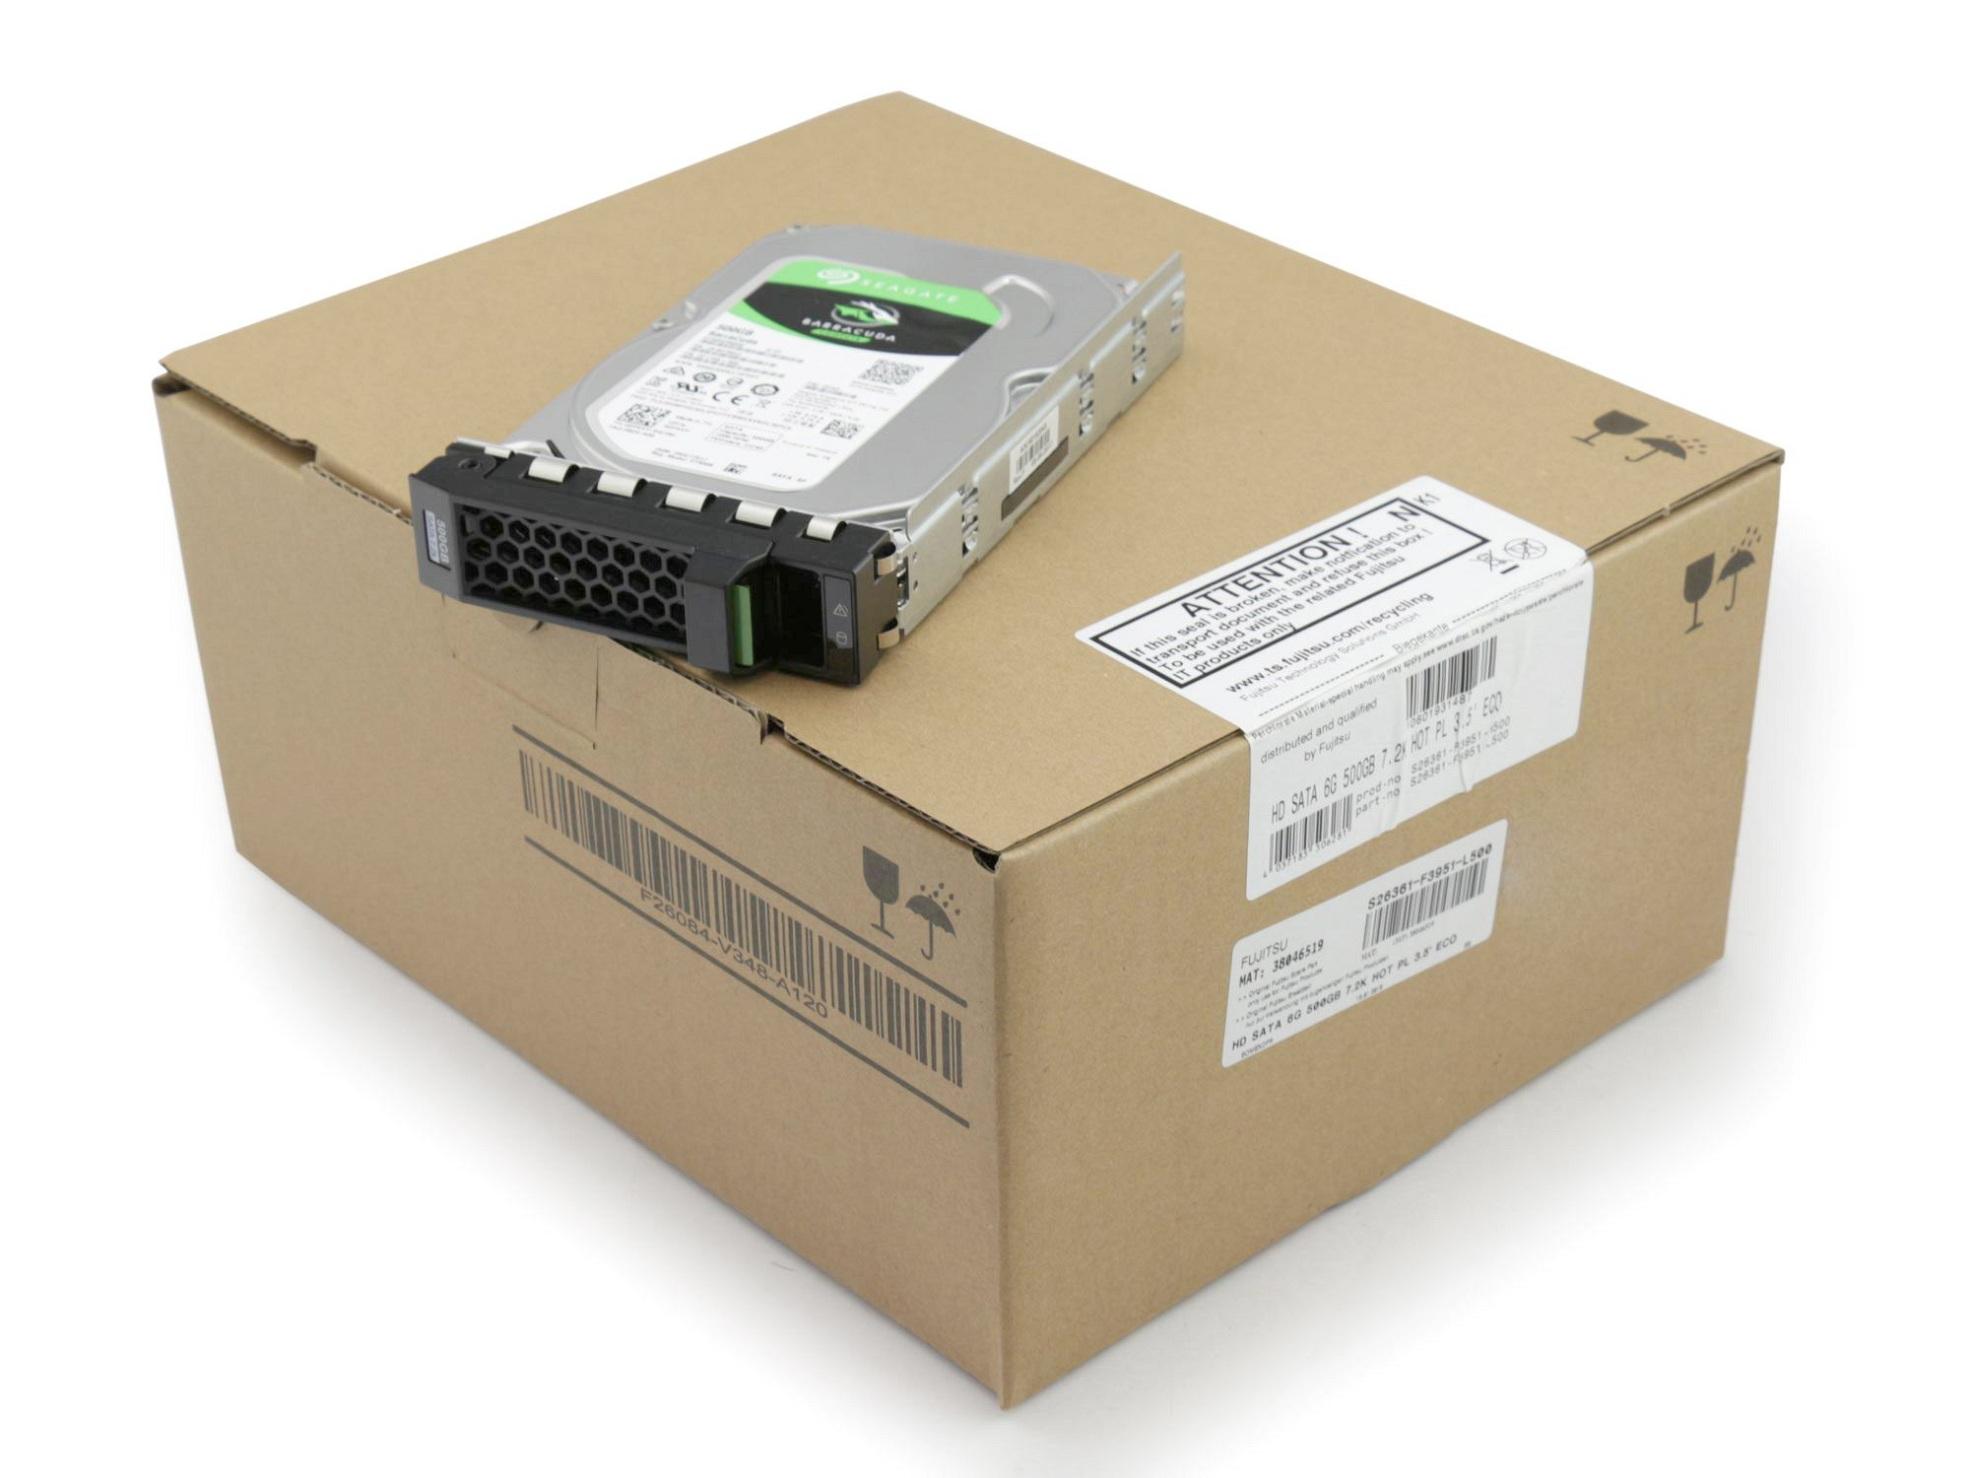 Server Festplatte HDD 500GB (3,5 Zoll / 8,9 cm) S-ATA III (6,0 Gb/s) ECO 7.2K inkl. Hot-Plug für Fujitsu Primergy TX1330 M2